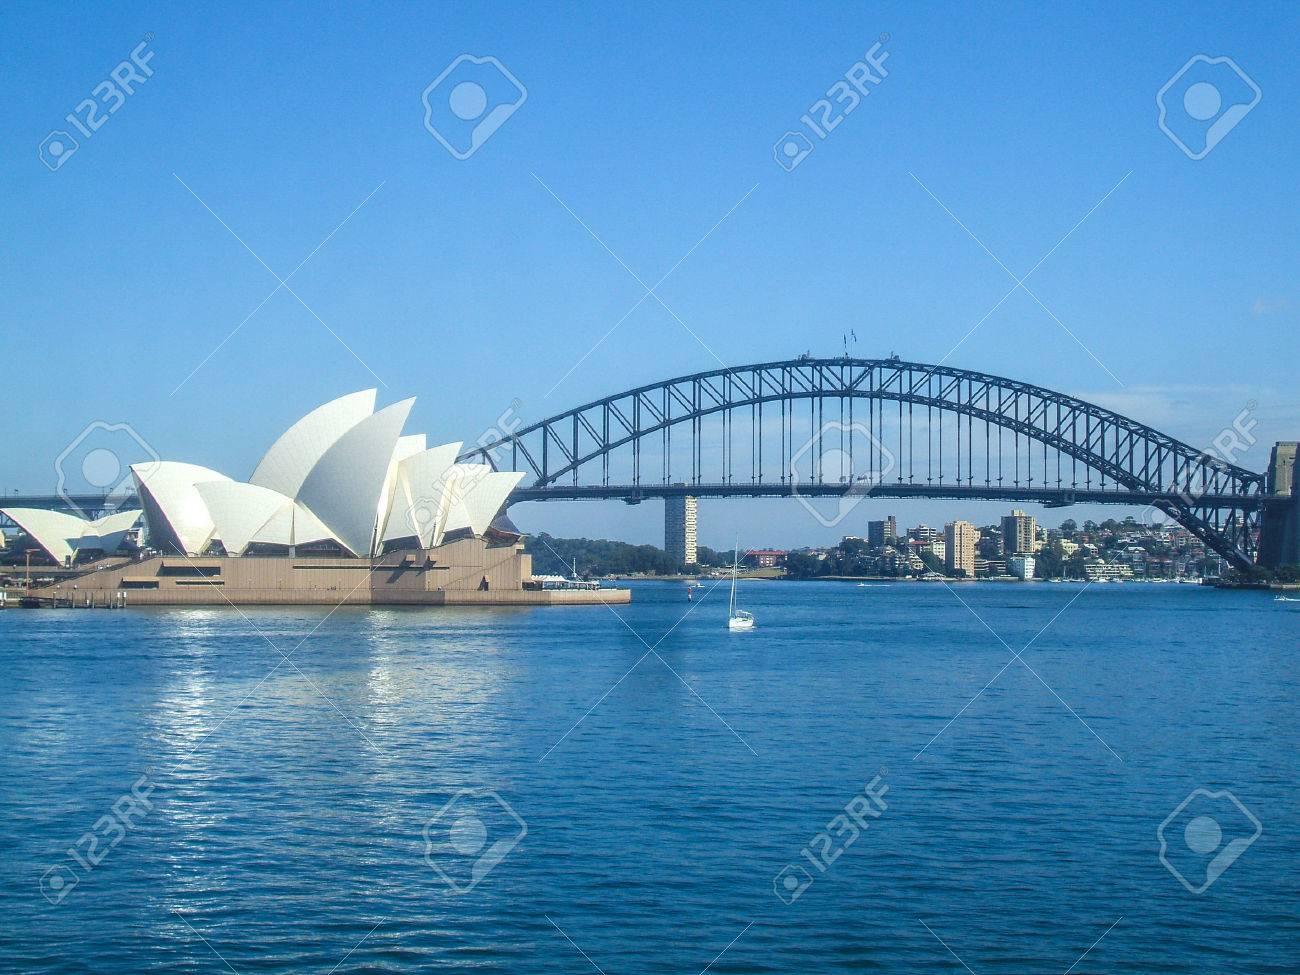 Sydney opera house and harbour bridge - Sydney Opera House Sydney Harbour Bridge Road Bridge City Australia Sydney Beautiful Curve House People Habitat